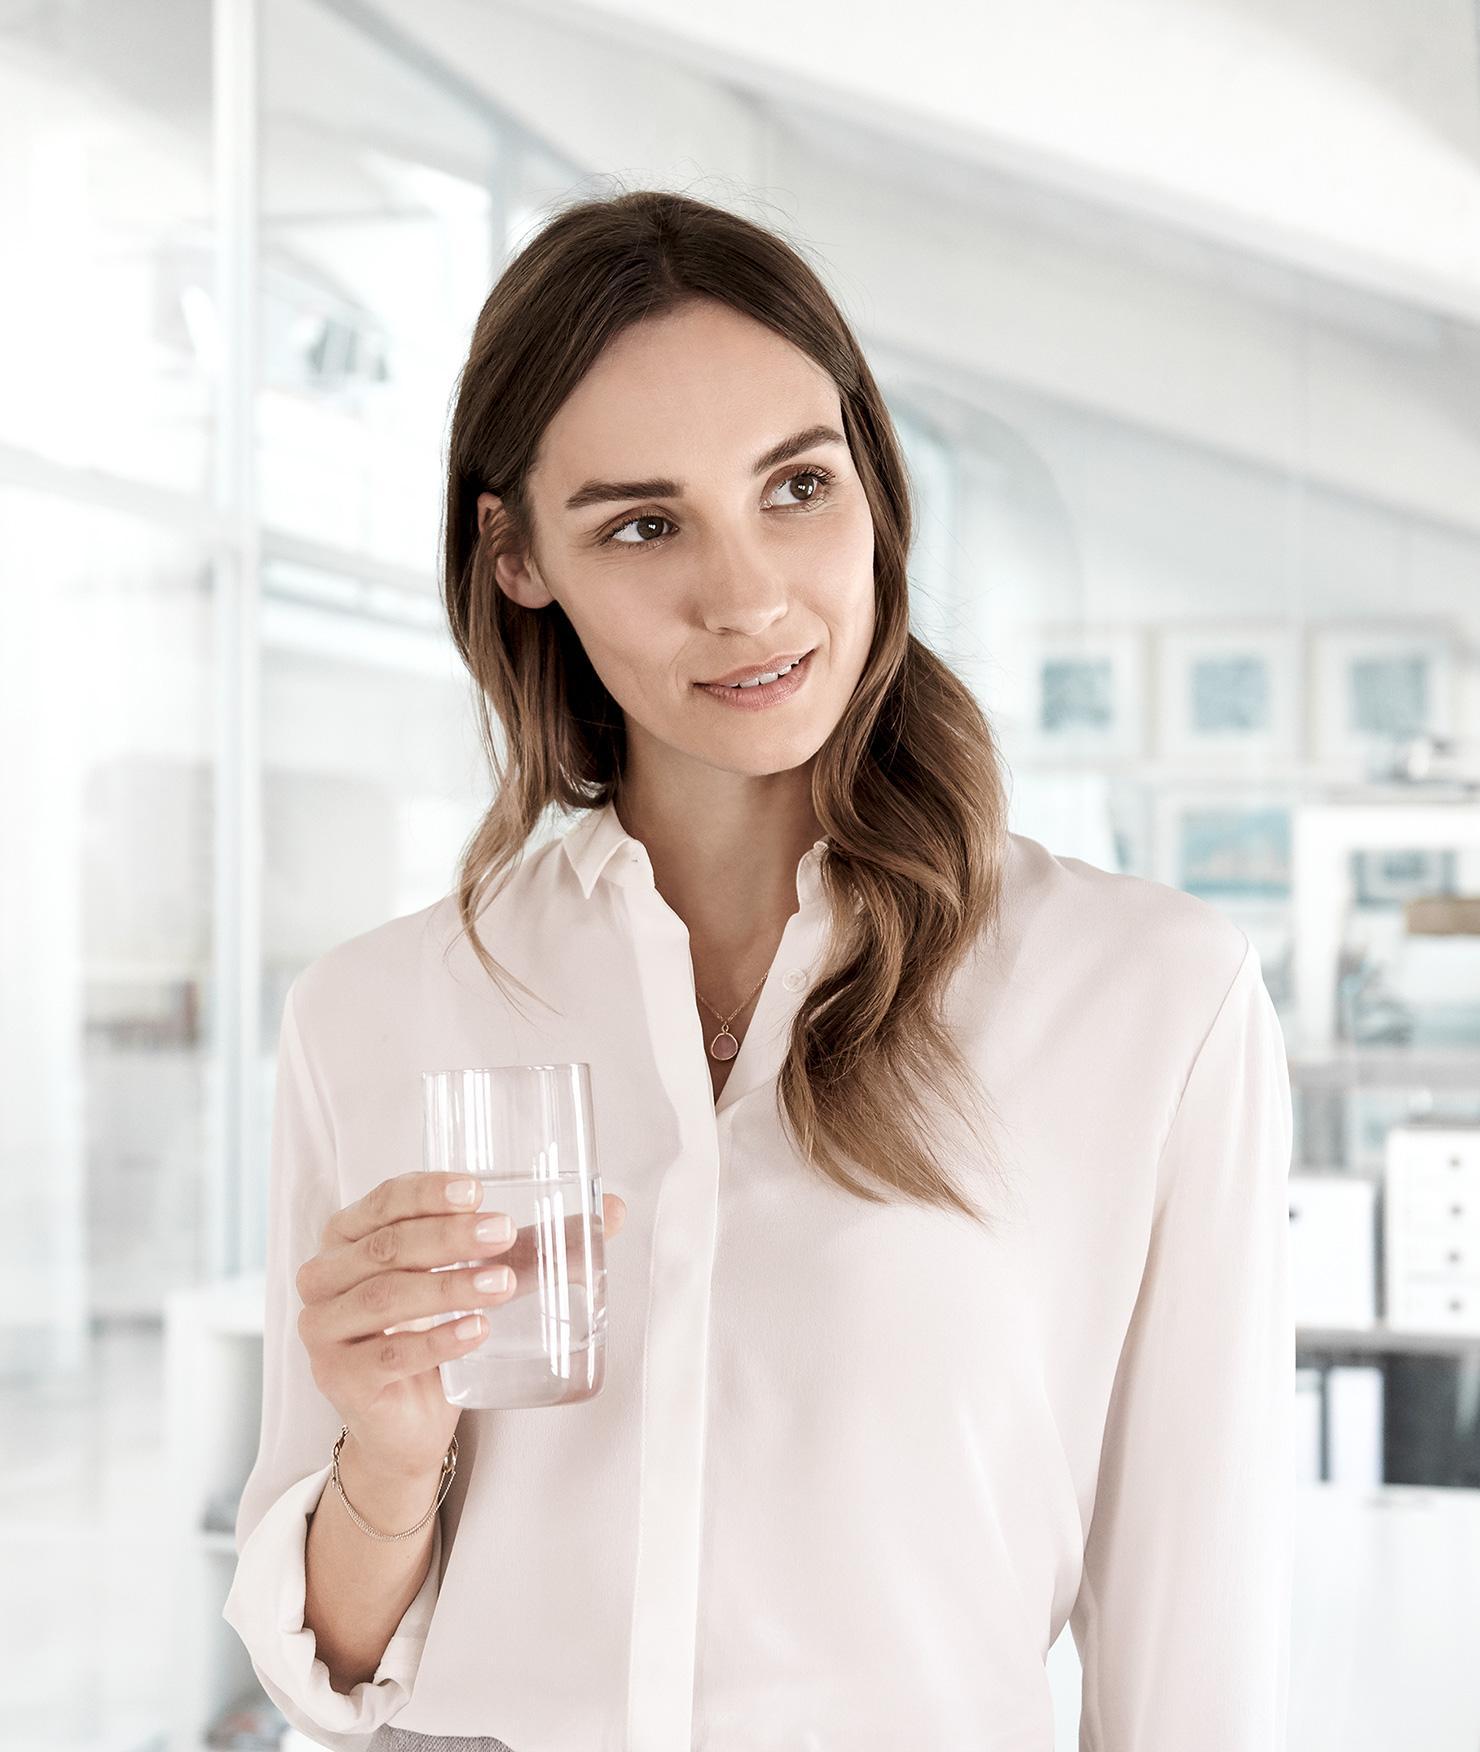 BRITA PURITY C 1000 AC ufficio donna bicchiere